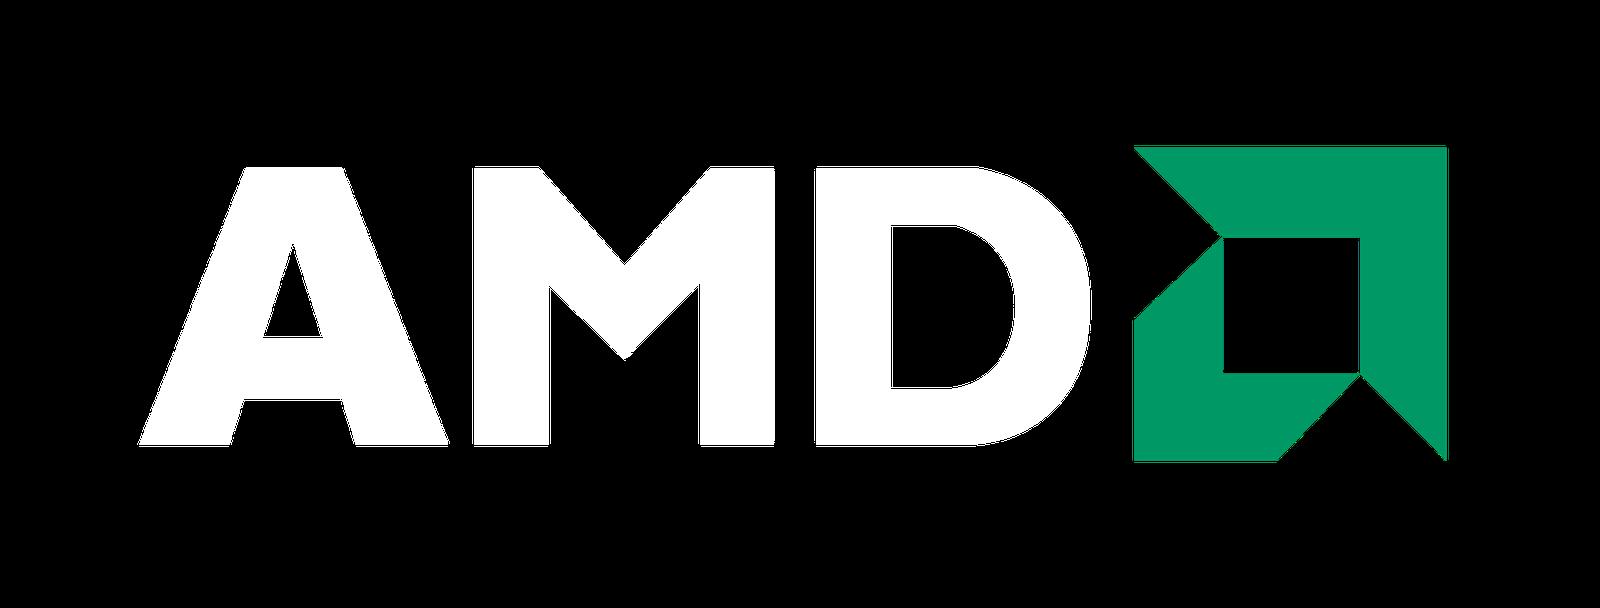 Nadia Art Logo Amd Logo